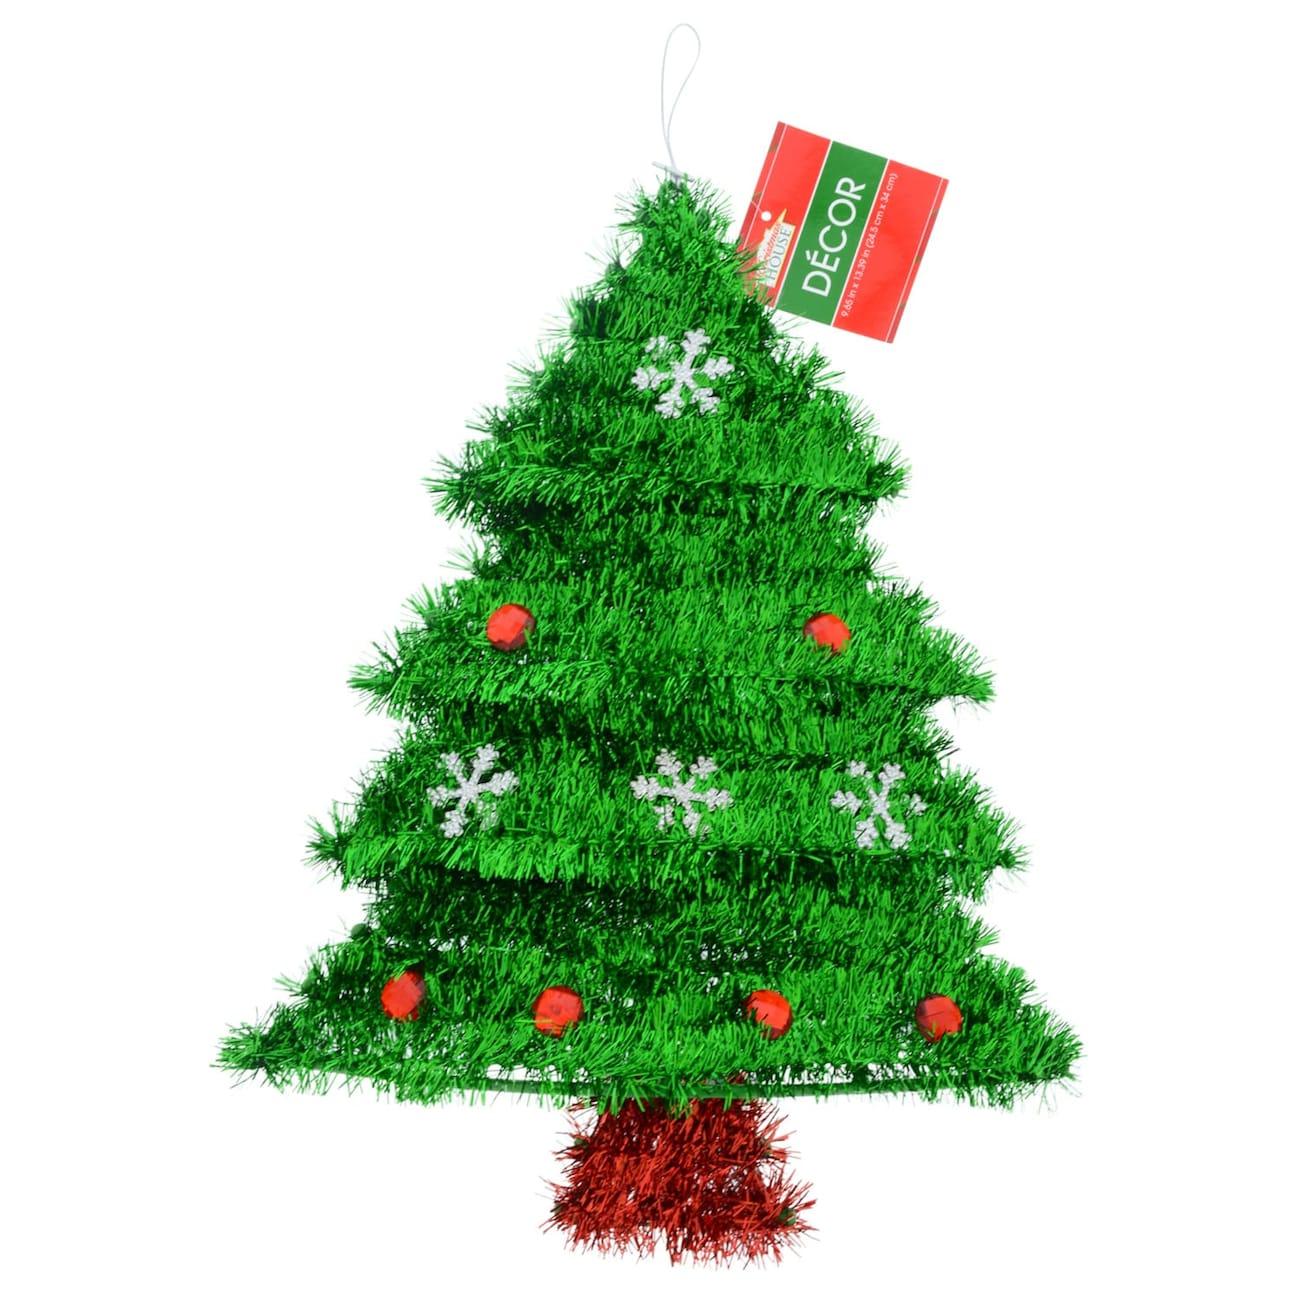 christmas house tinsel tree with ornaments - Dollar Tree Christmas Tree